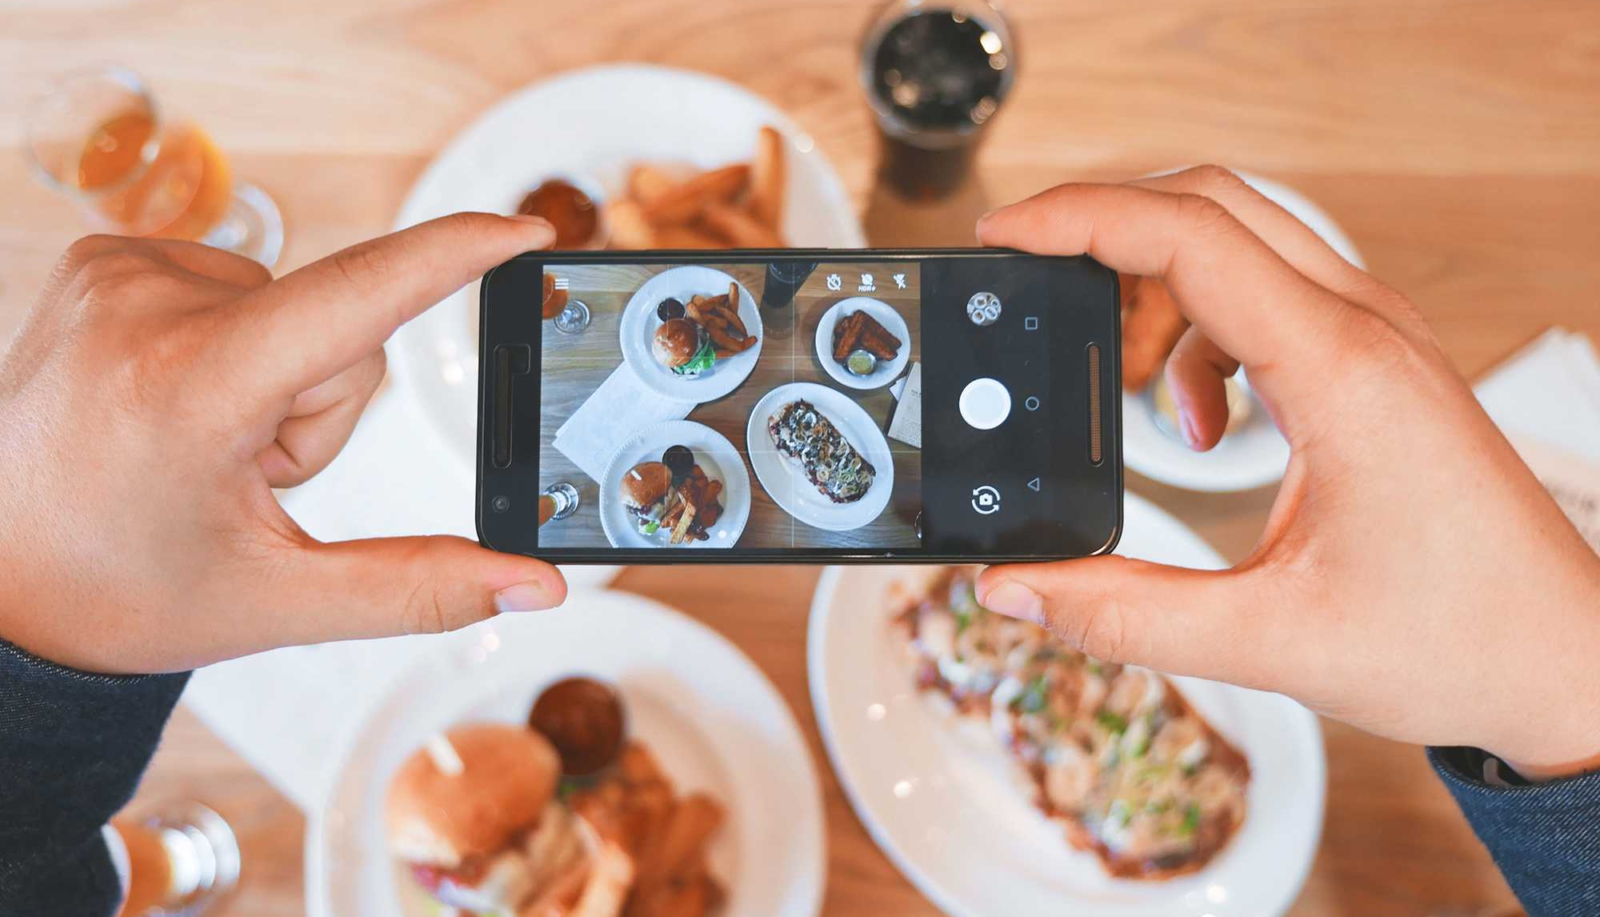 Instagram food pic